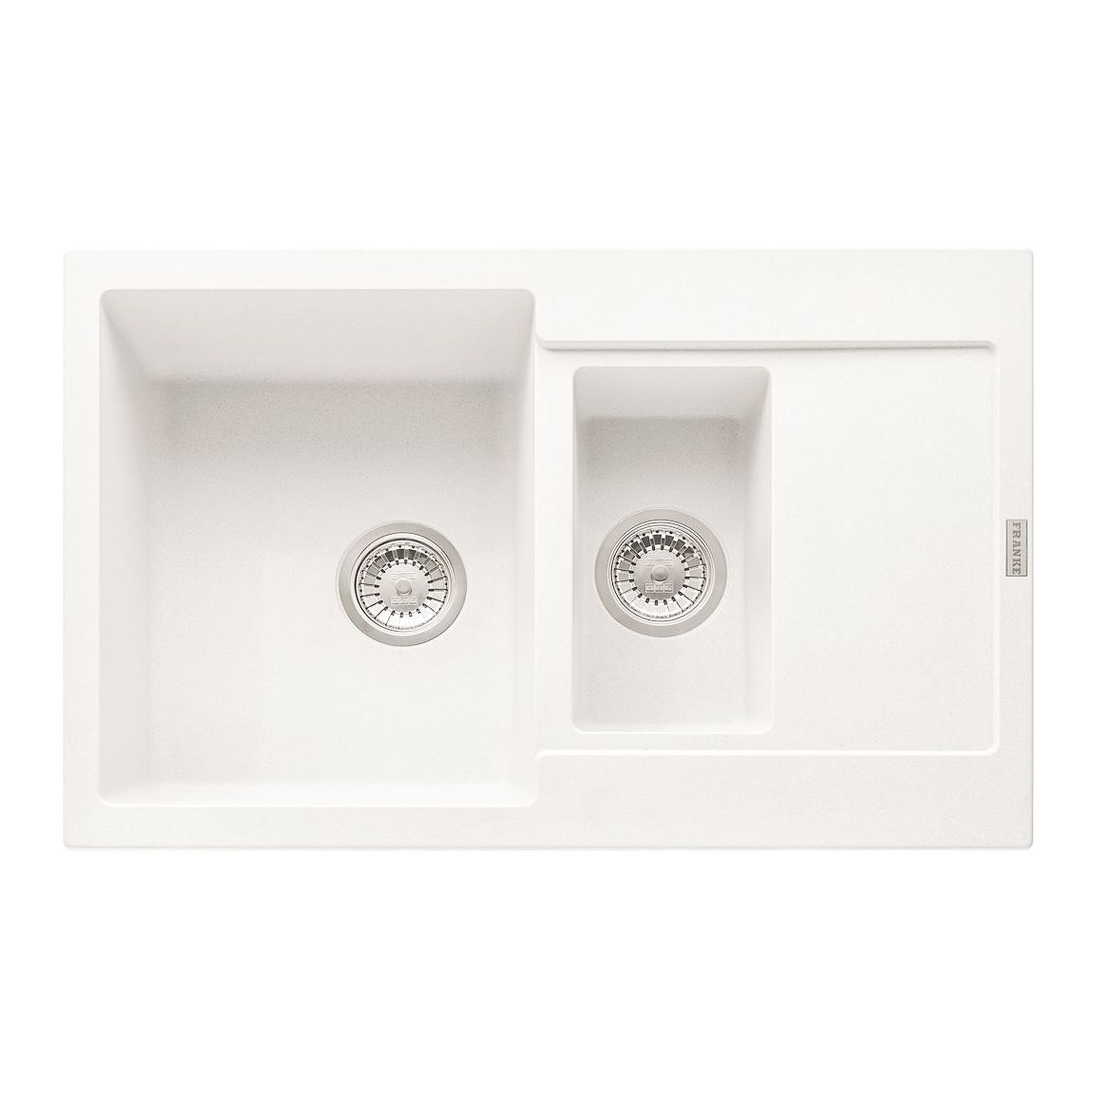 Кухонная мойка Franke Maris MRG 651-78 белый кухонная мойка franke mrg 651 78 оникс 114 0198 272